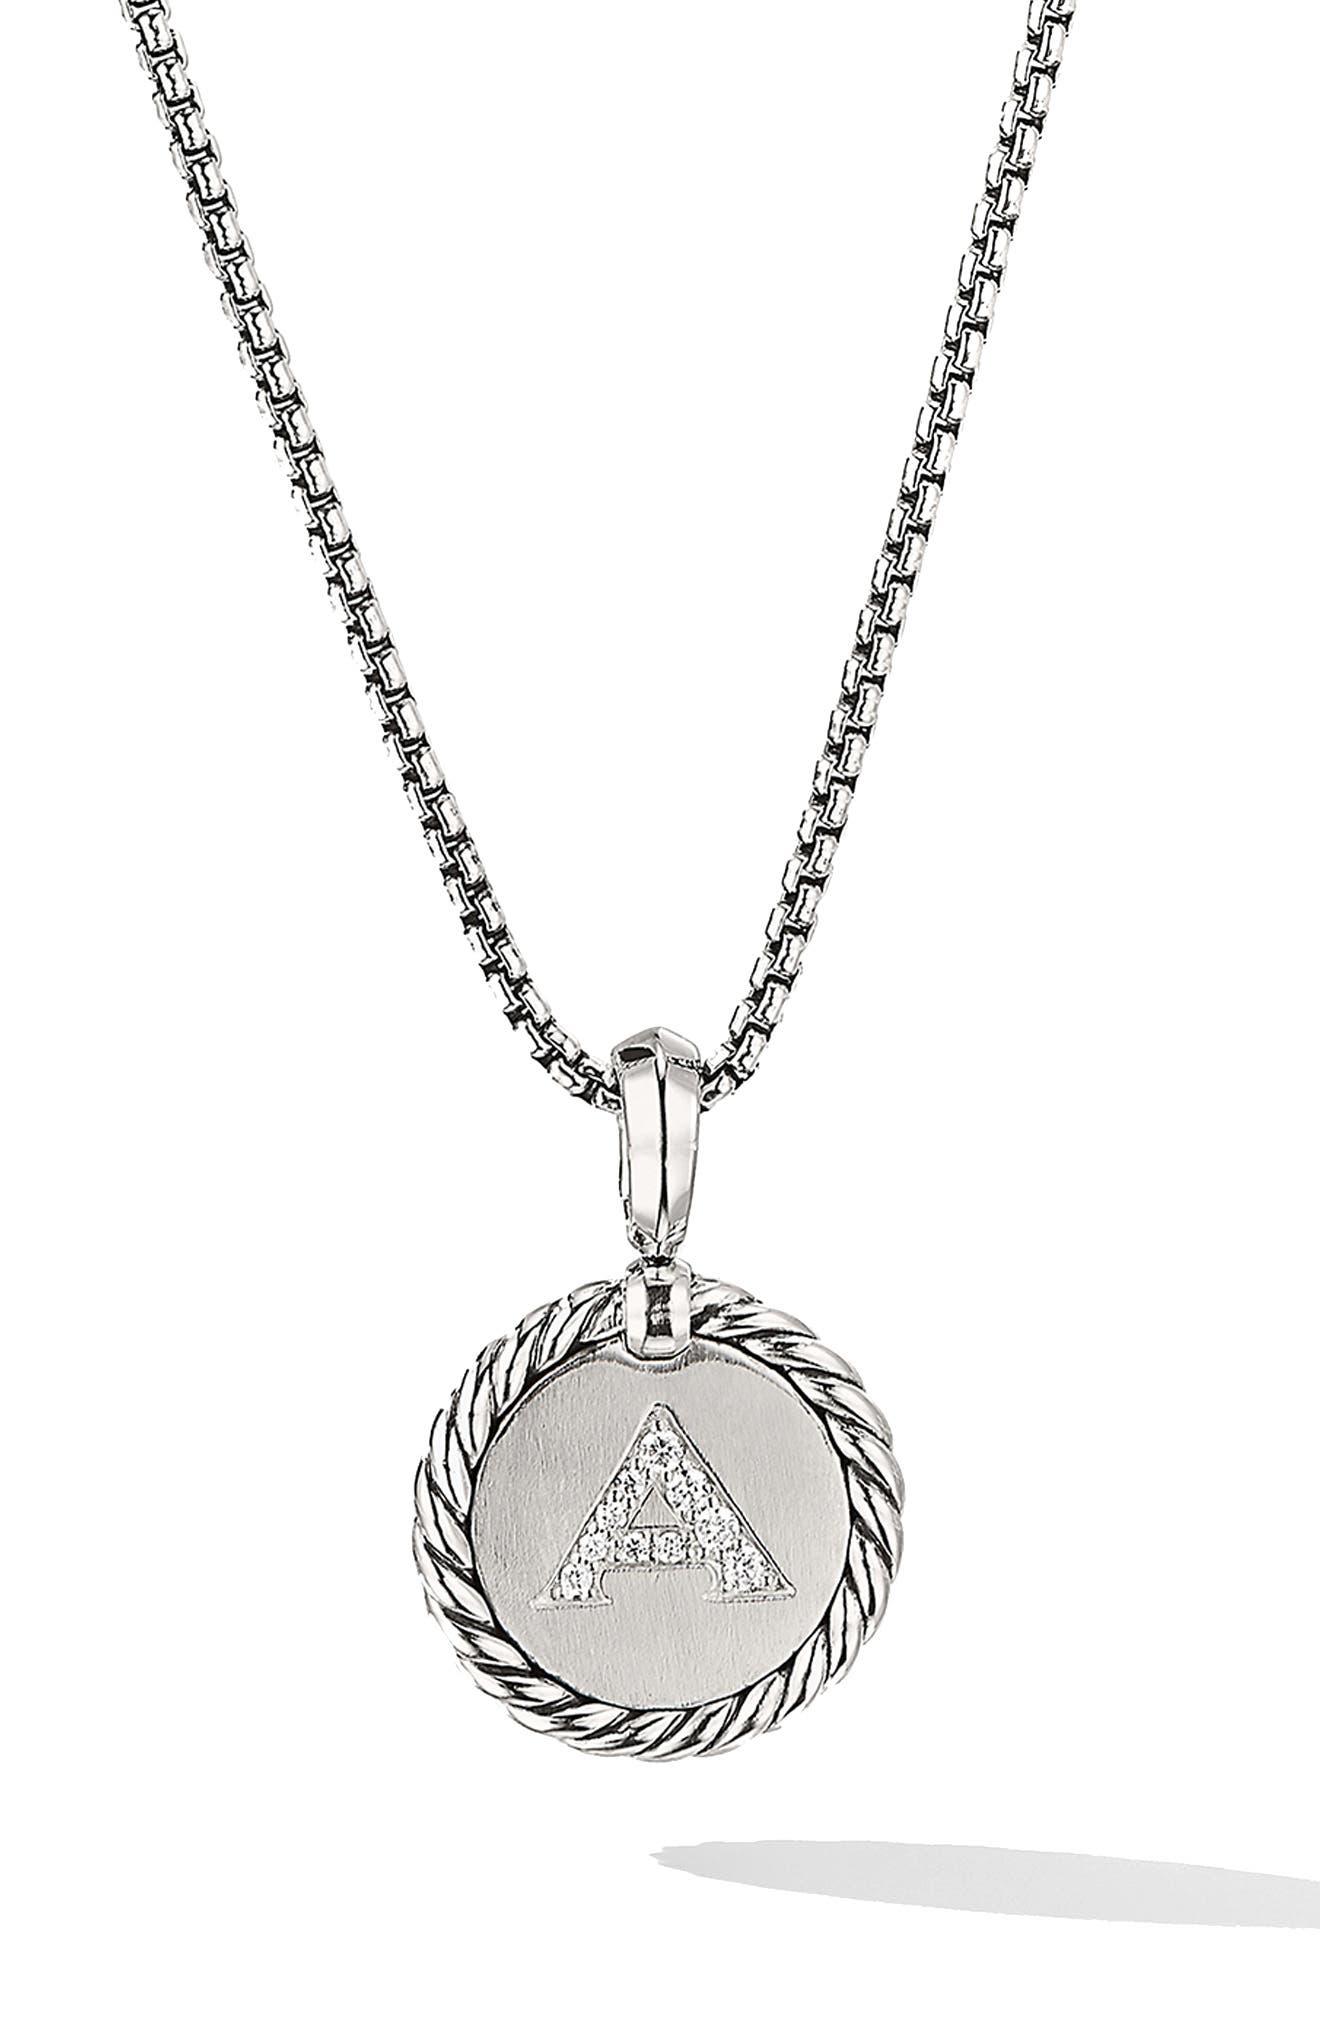 DAVID YURMAN Initial Charm Necklace with Diamonds, Main, color, SILVER/ DIAMOND-A